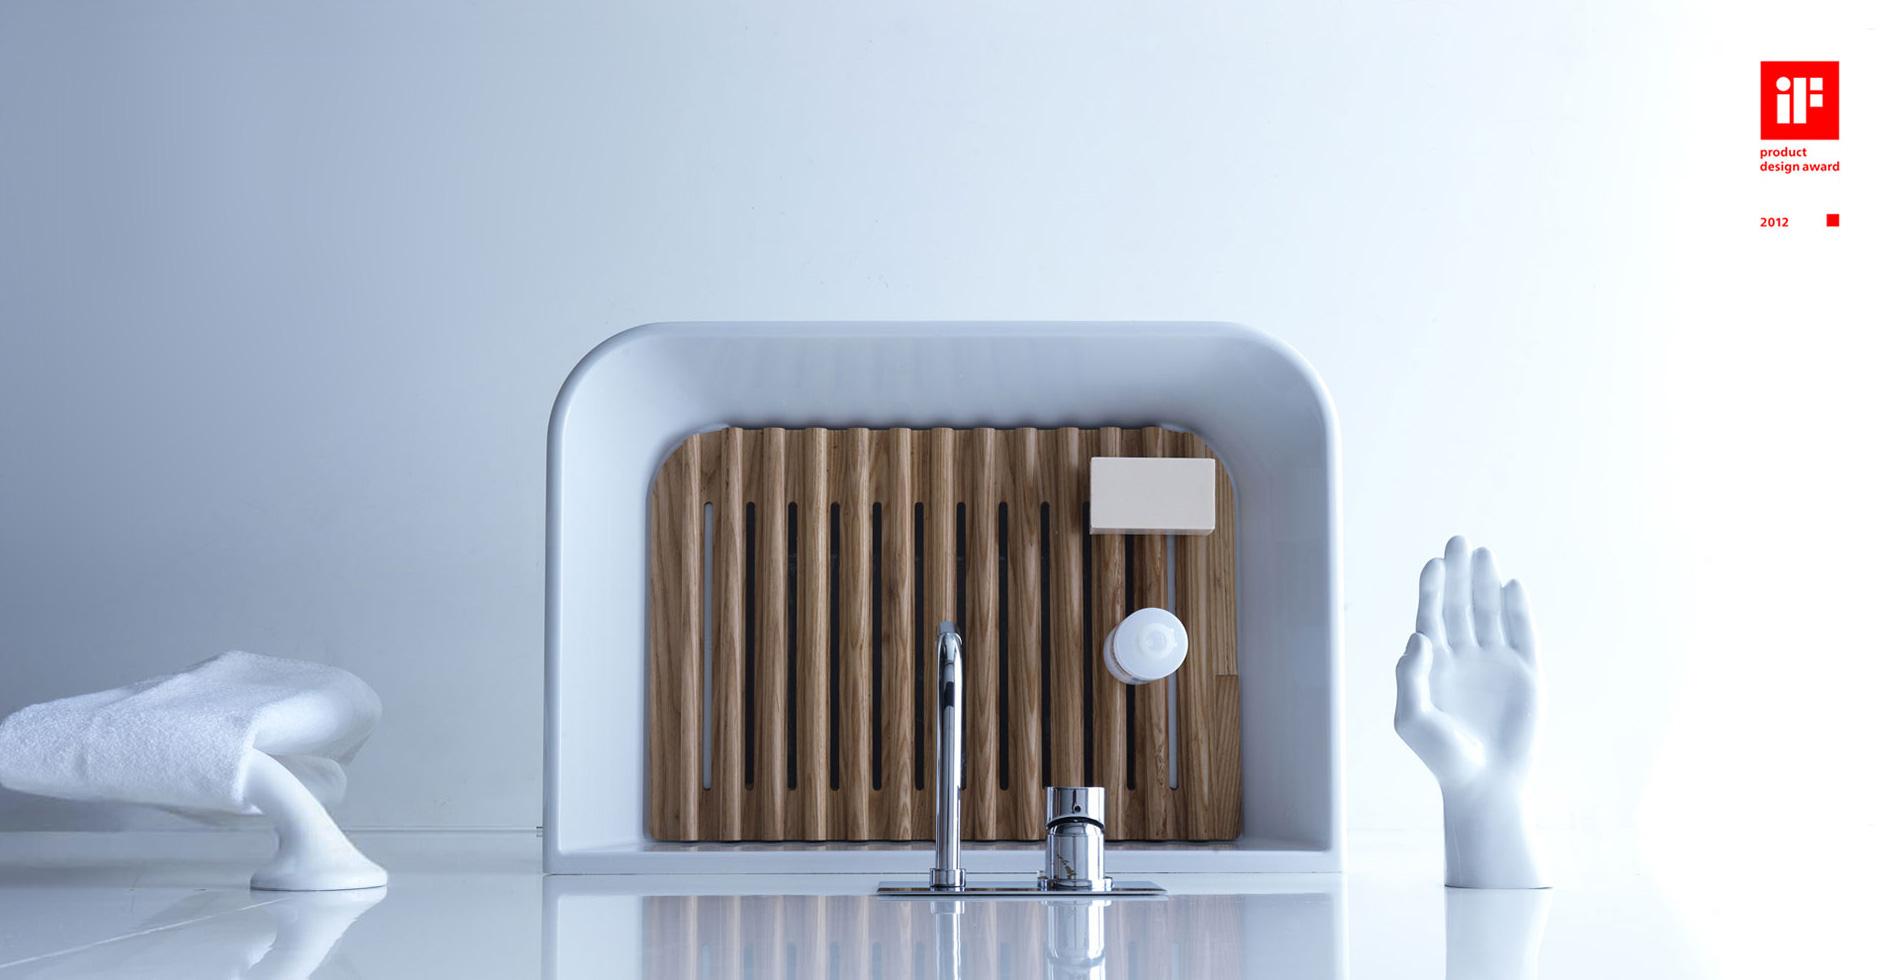 Bathroom deco - MEG11 - washbasin washboard of ash wood | IF Product Design Award 2012| Design by Antonio Pascale for Galassia